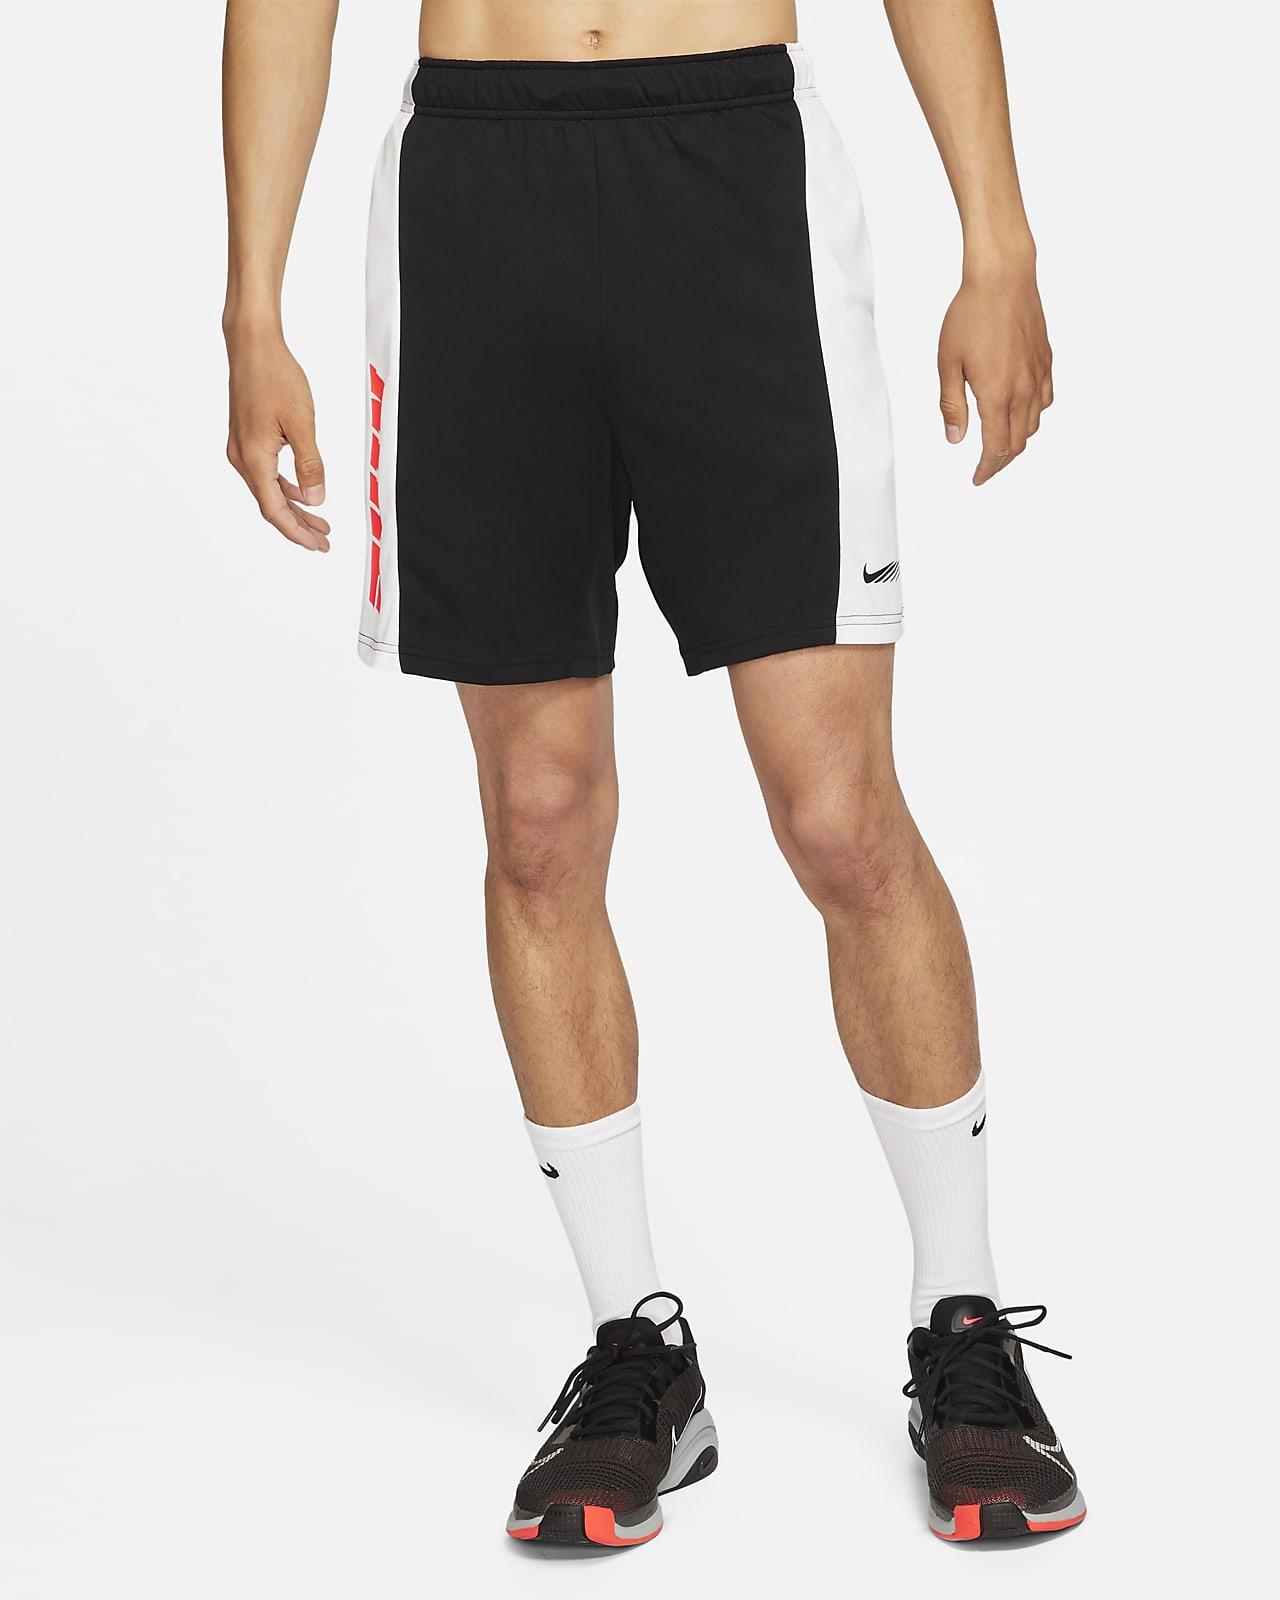 Nike Dri-FIT 男子训练短裤